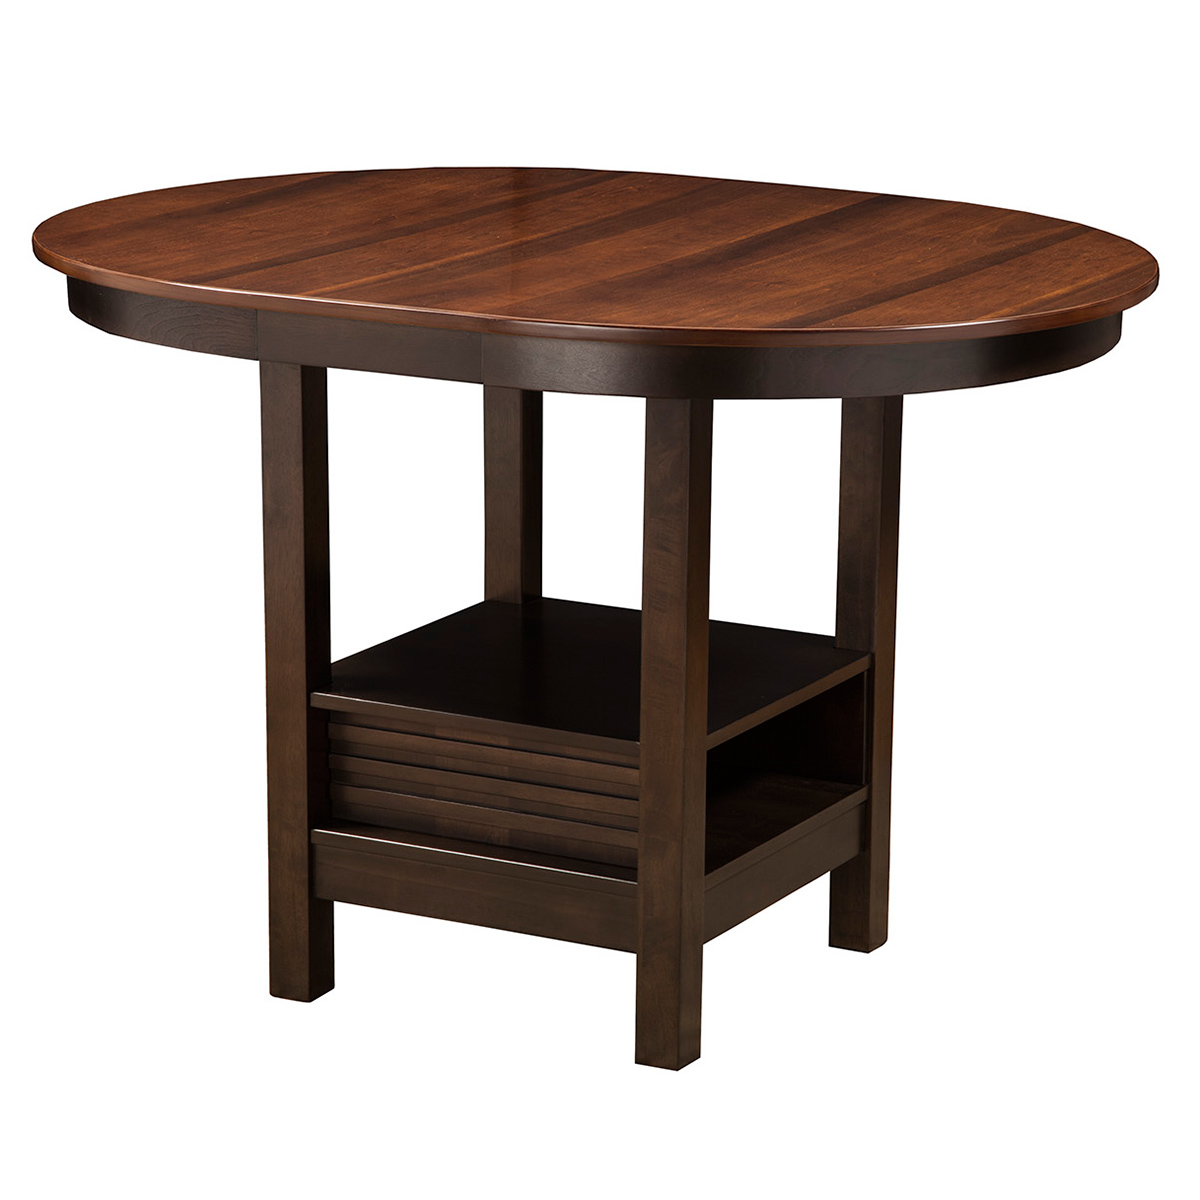 Alpine Furniture 5442 01 Davenport Oval Pub Table in  : 5442 01 from www.dynamichomedecor.com size 1200 x 1200 jpeg 222kB